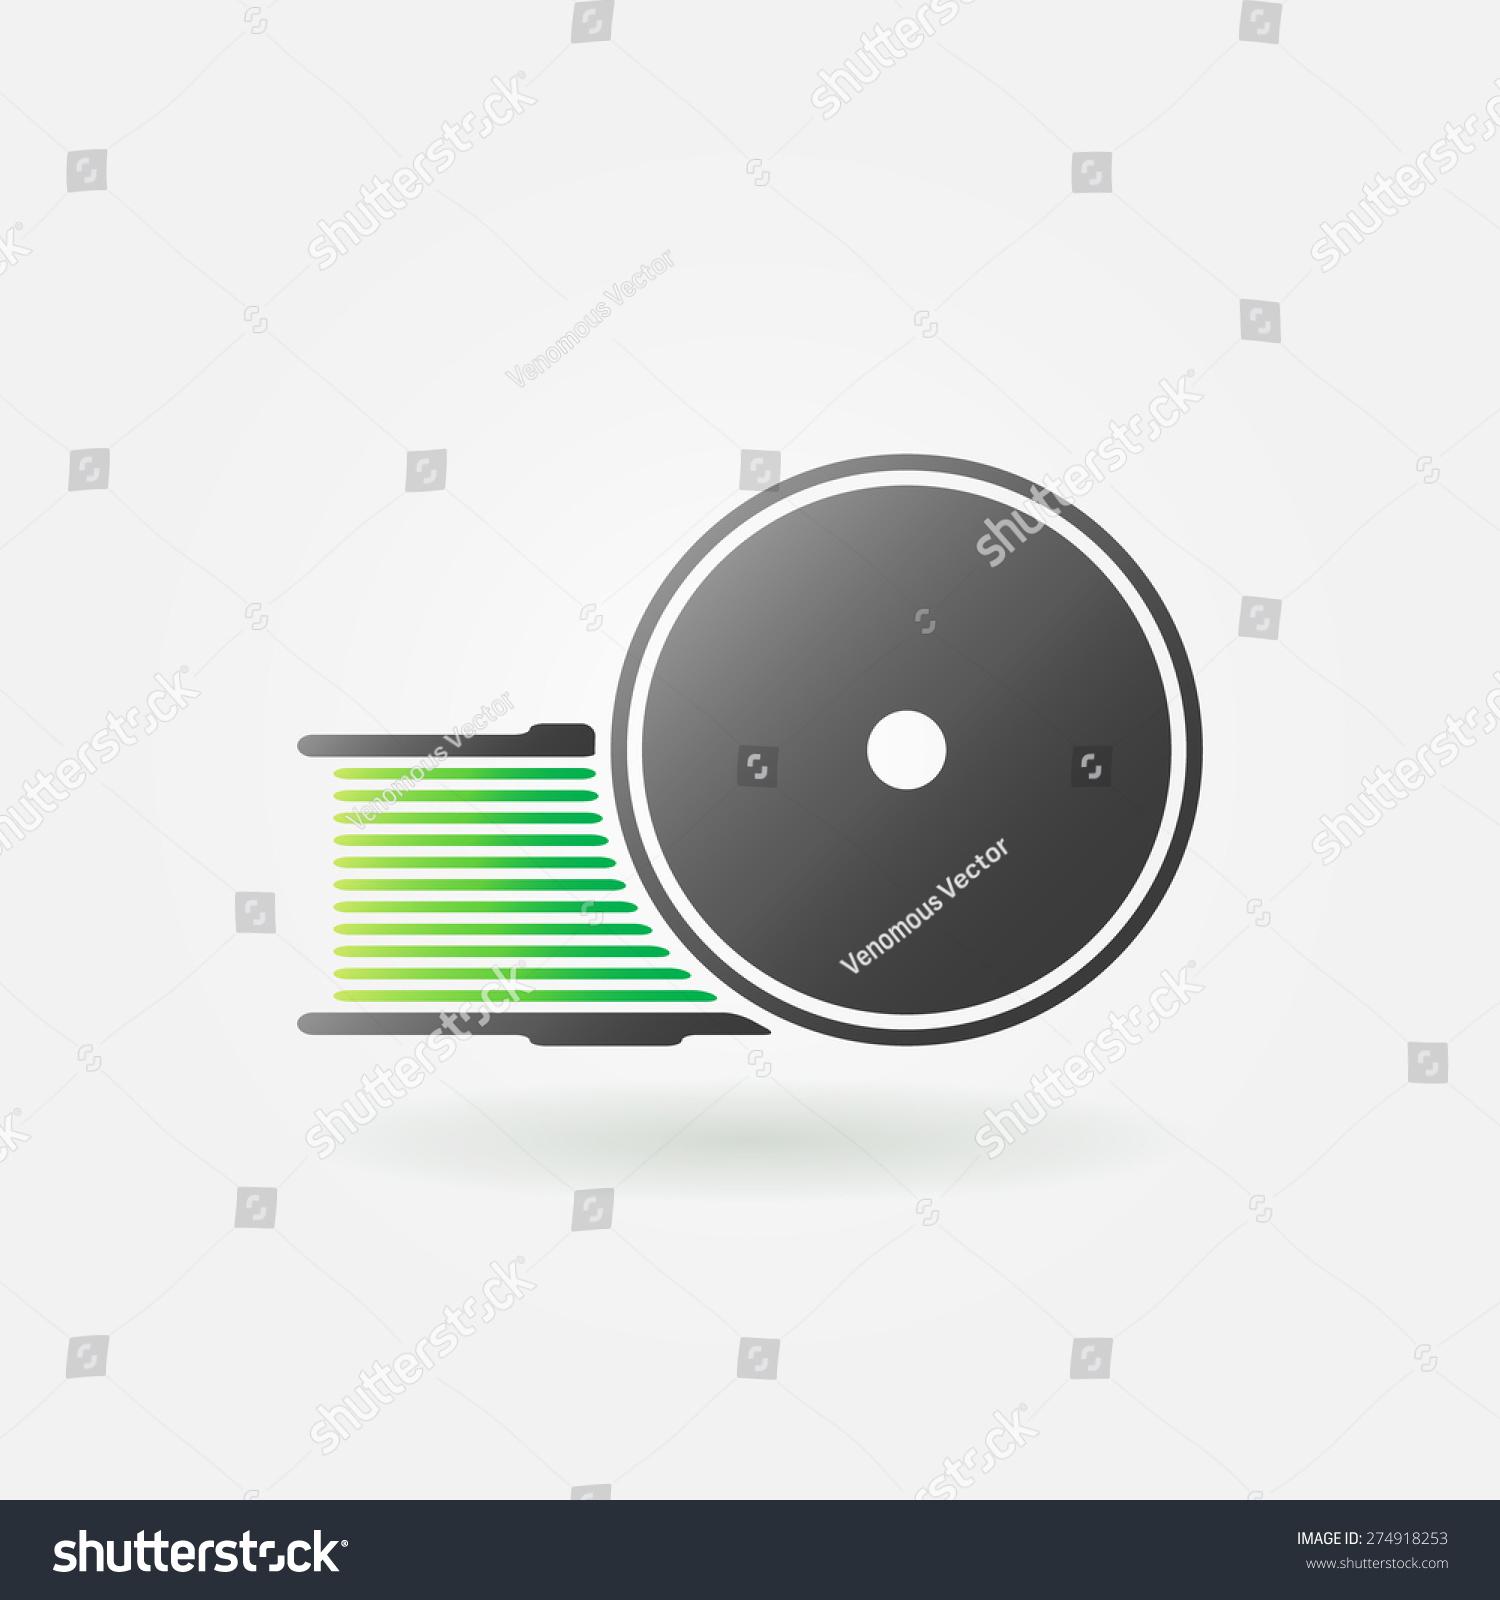 Green Filament 3d Printer Icon Logo Stock-vektorgrafik 274918253 ...